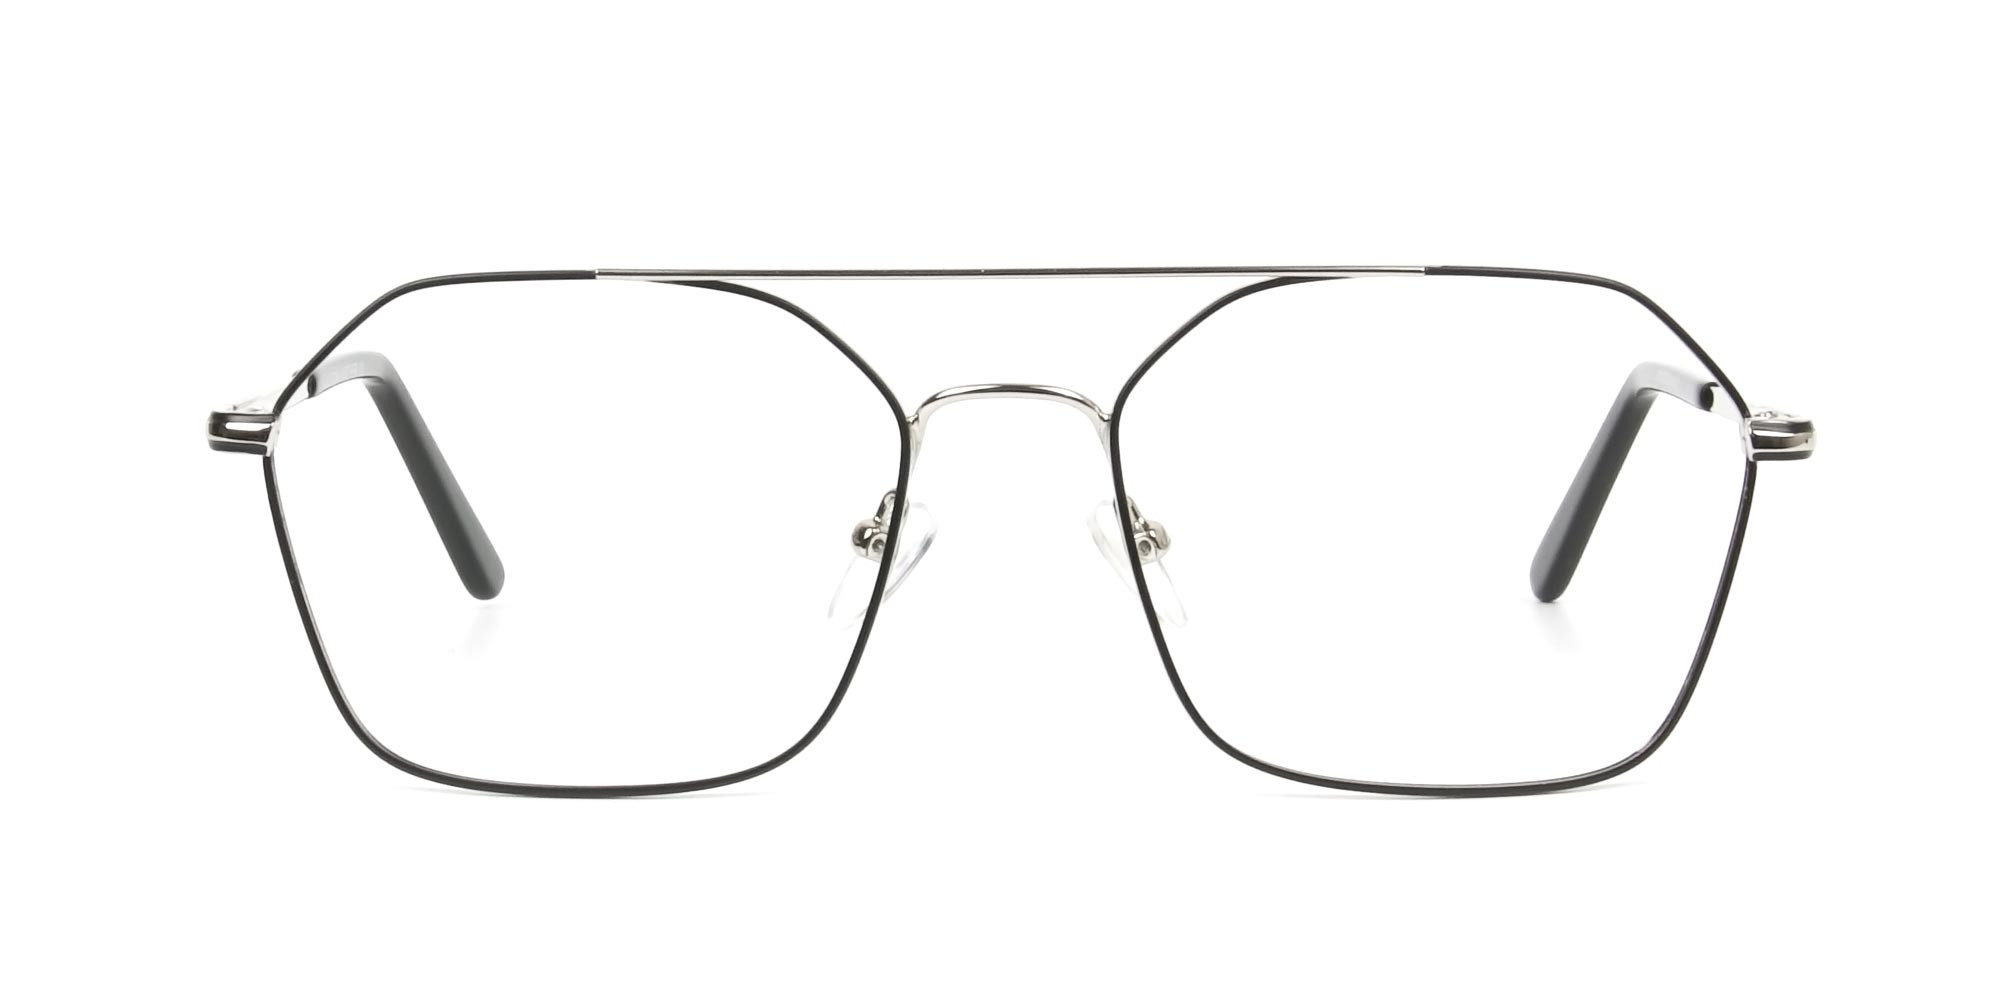 Geometric Aviator Black & Silver Spectacles - 1